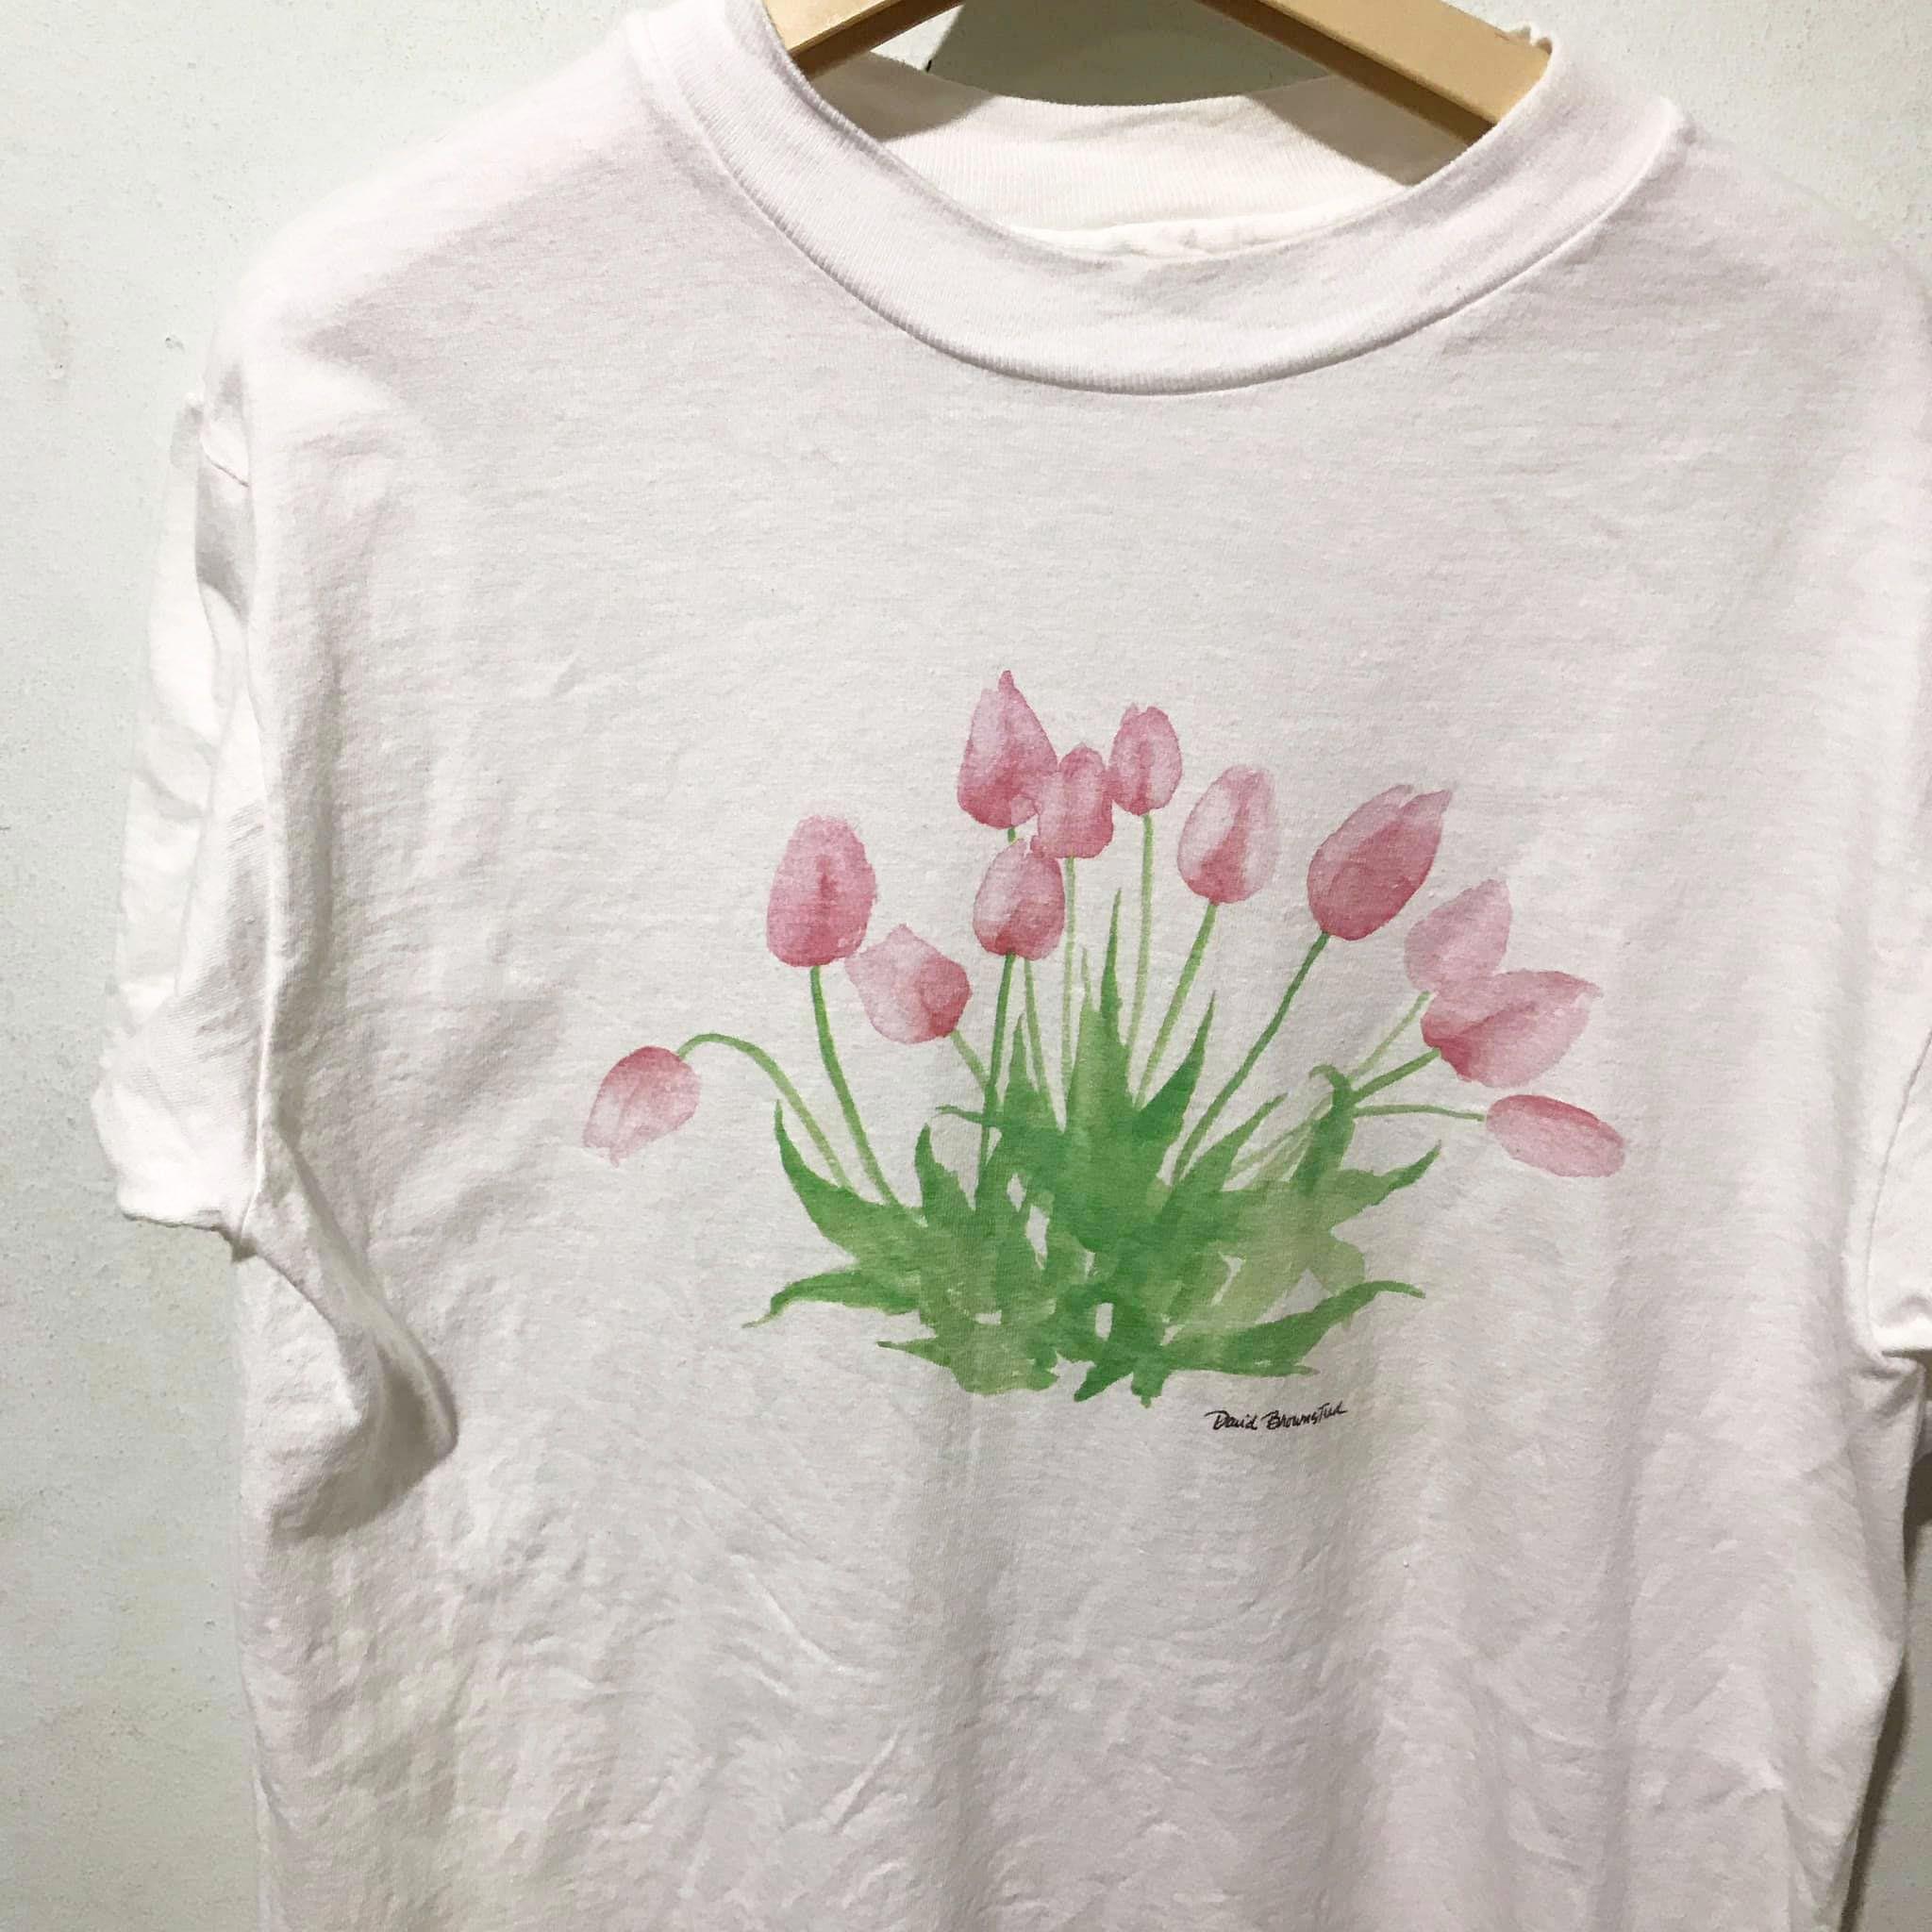 Vintage Flower Shirt Size M Free Shipping David Brownstead Artist